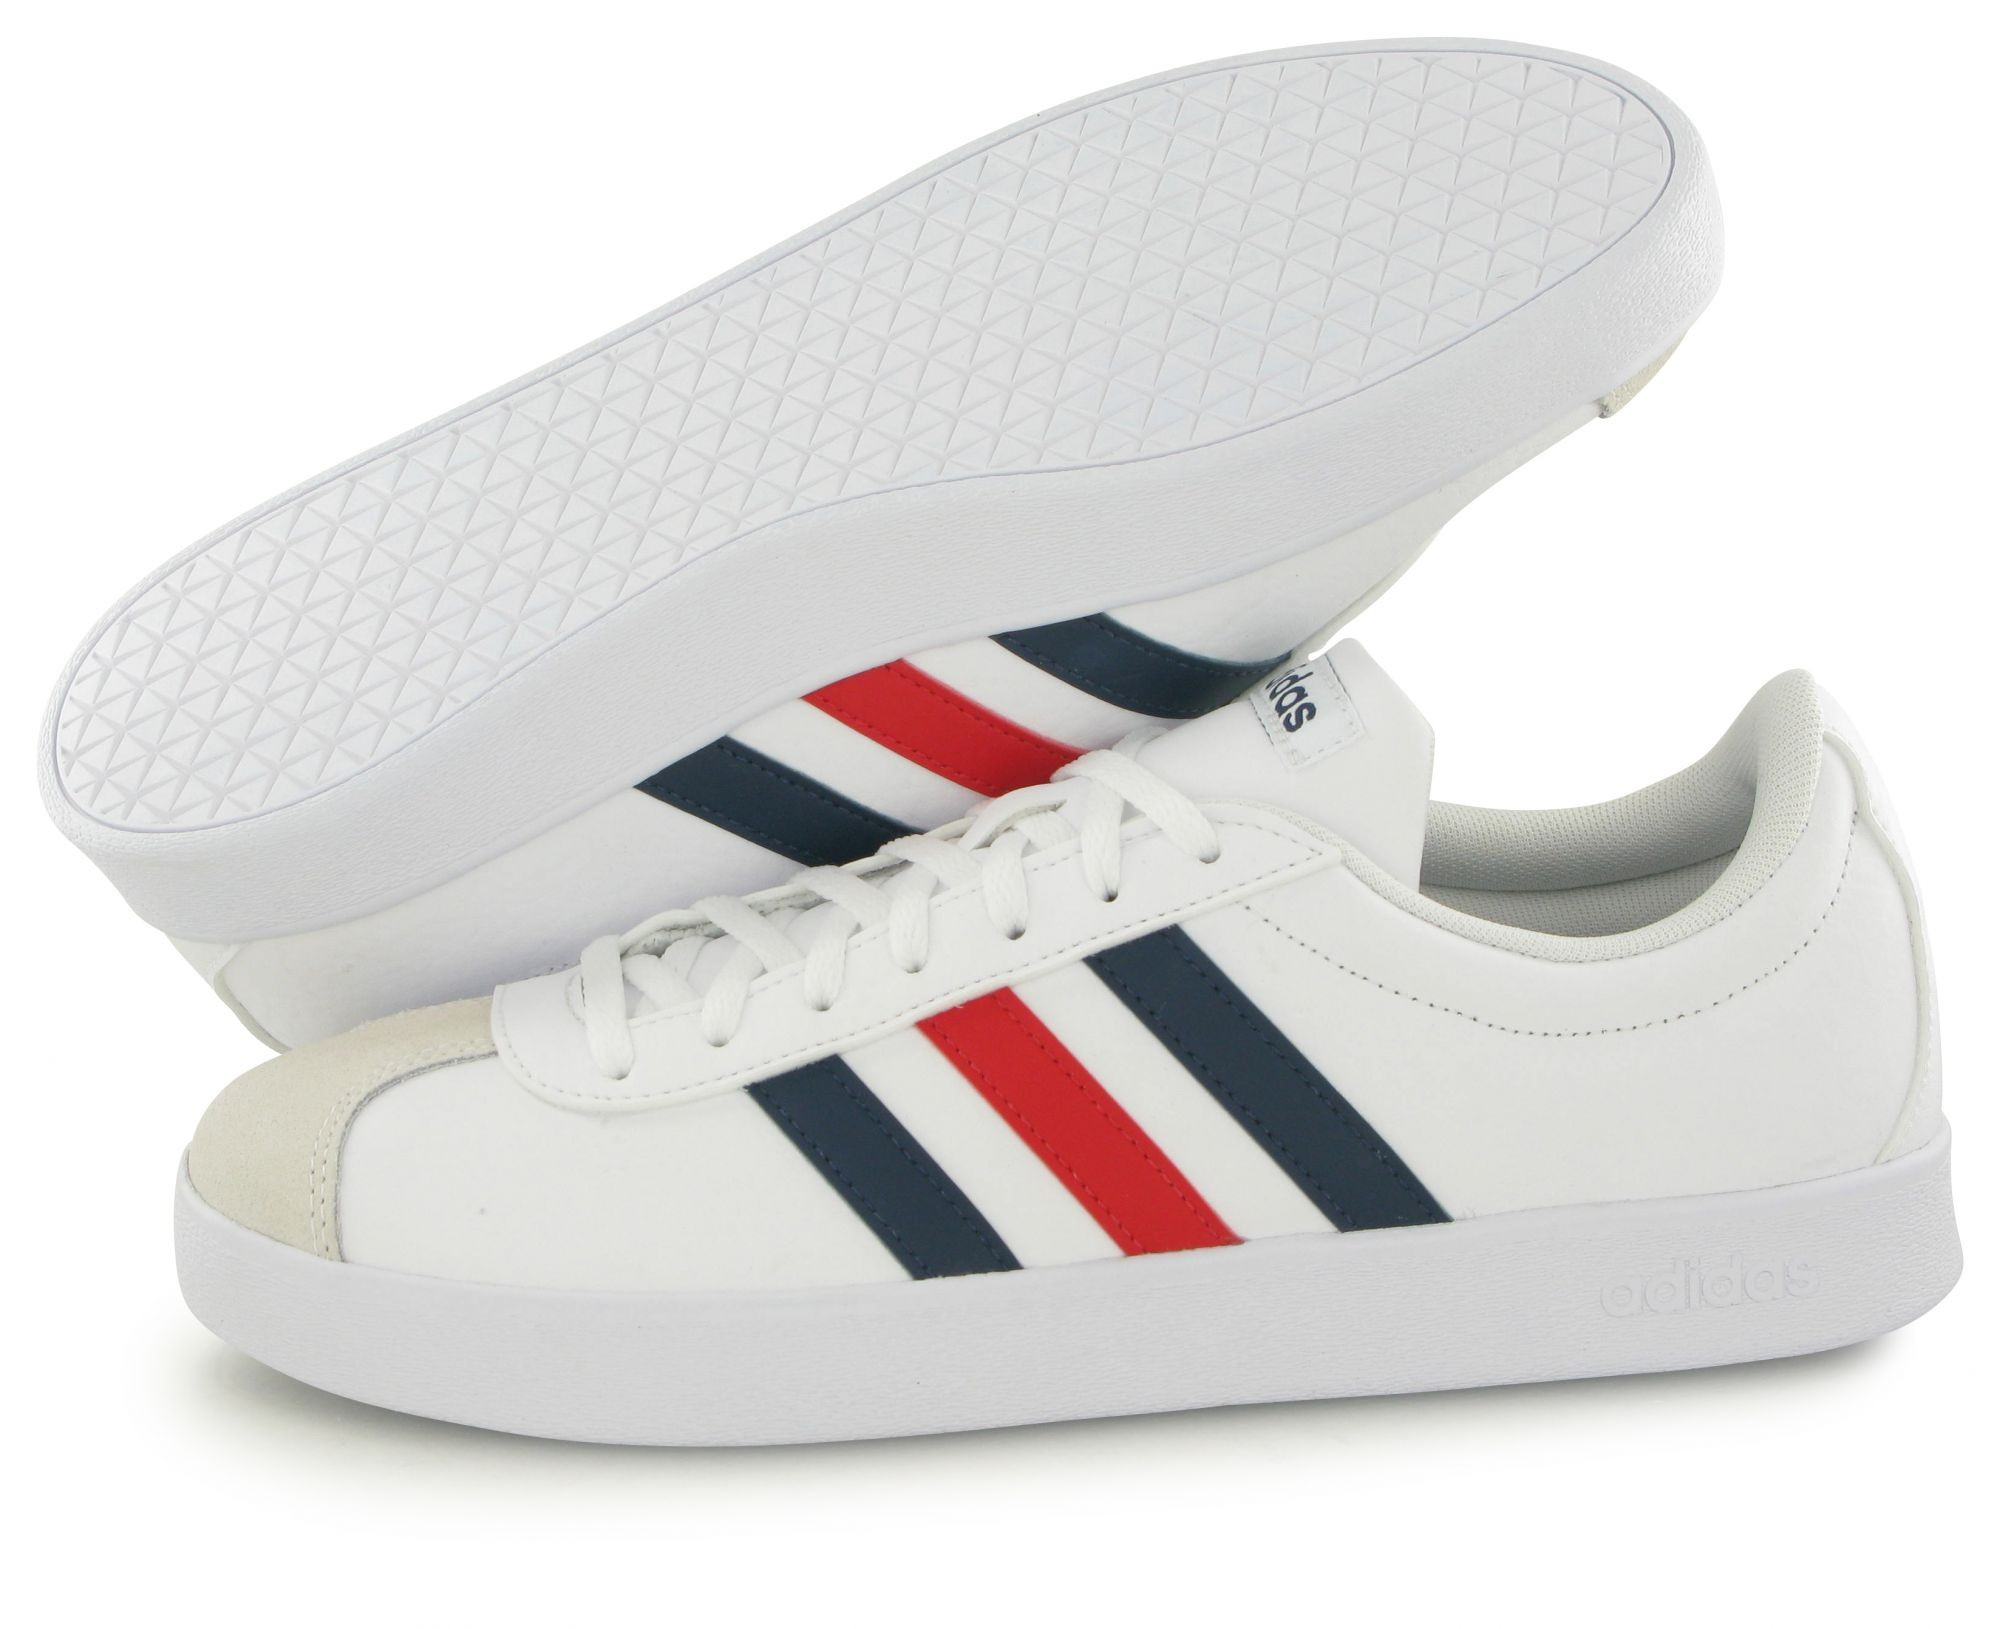 newest 1b0c9 b9628 Adidas Scarpe Sneakers Ginnastica Tennis Sportswear Lifestyle Vl Court  Bianco 7 7 di 8 ...